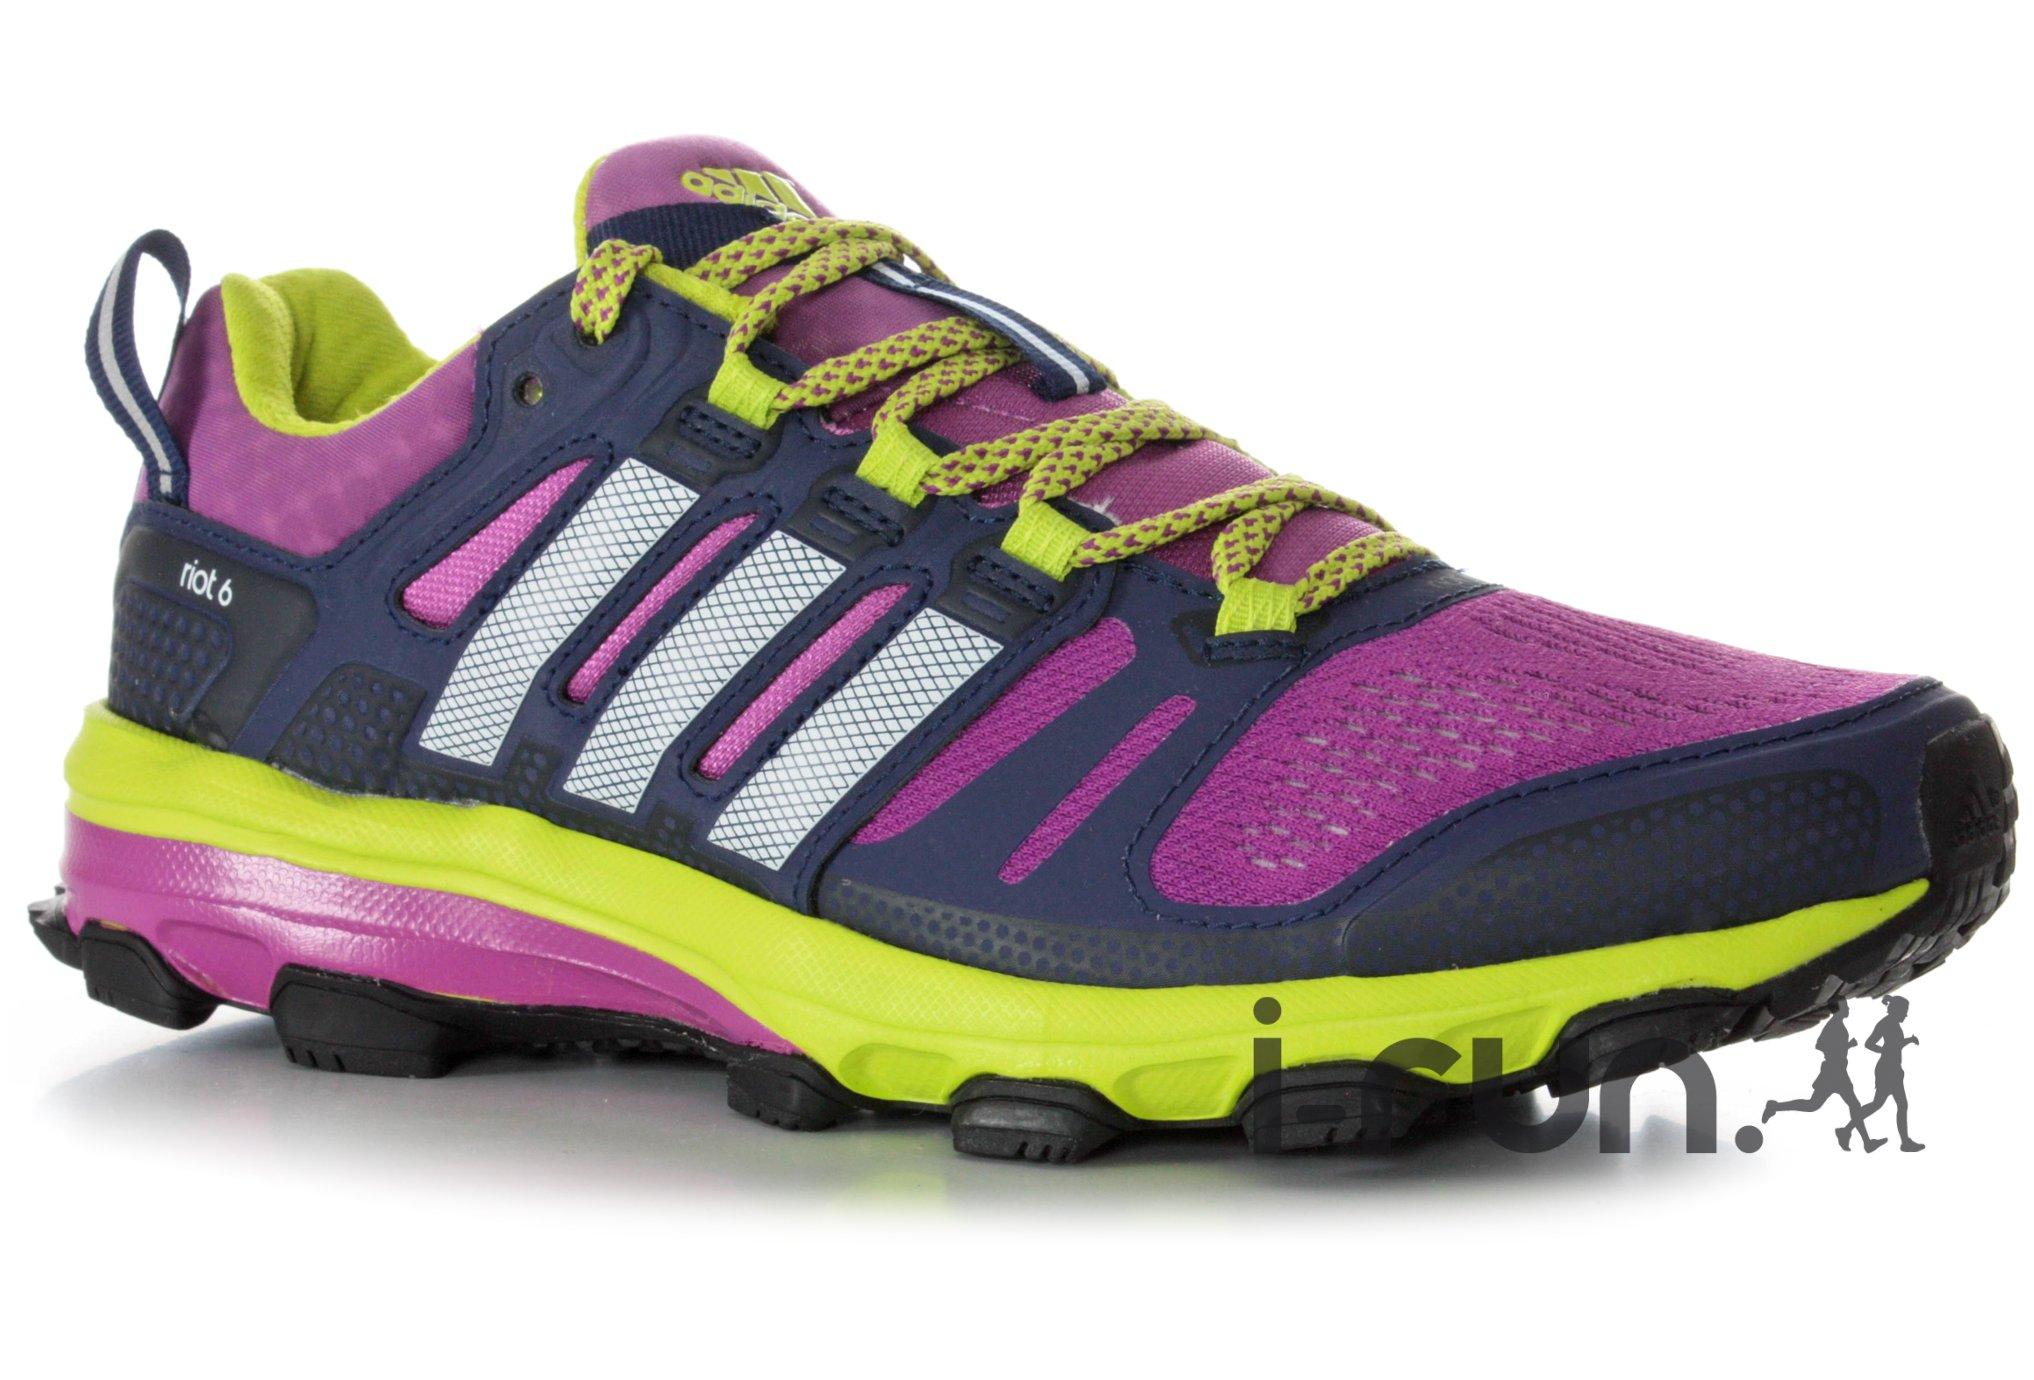 Adidas Supernova riot 6 w diététique chaussures femme